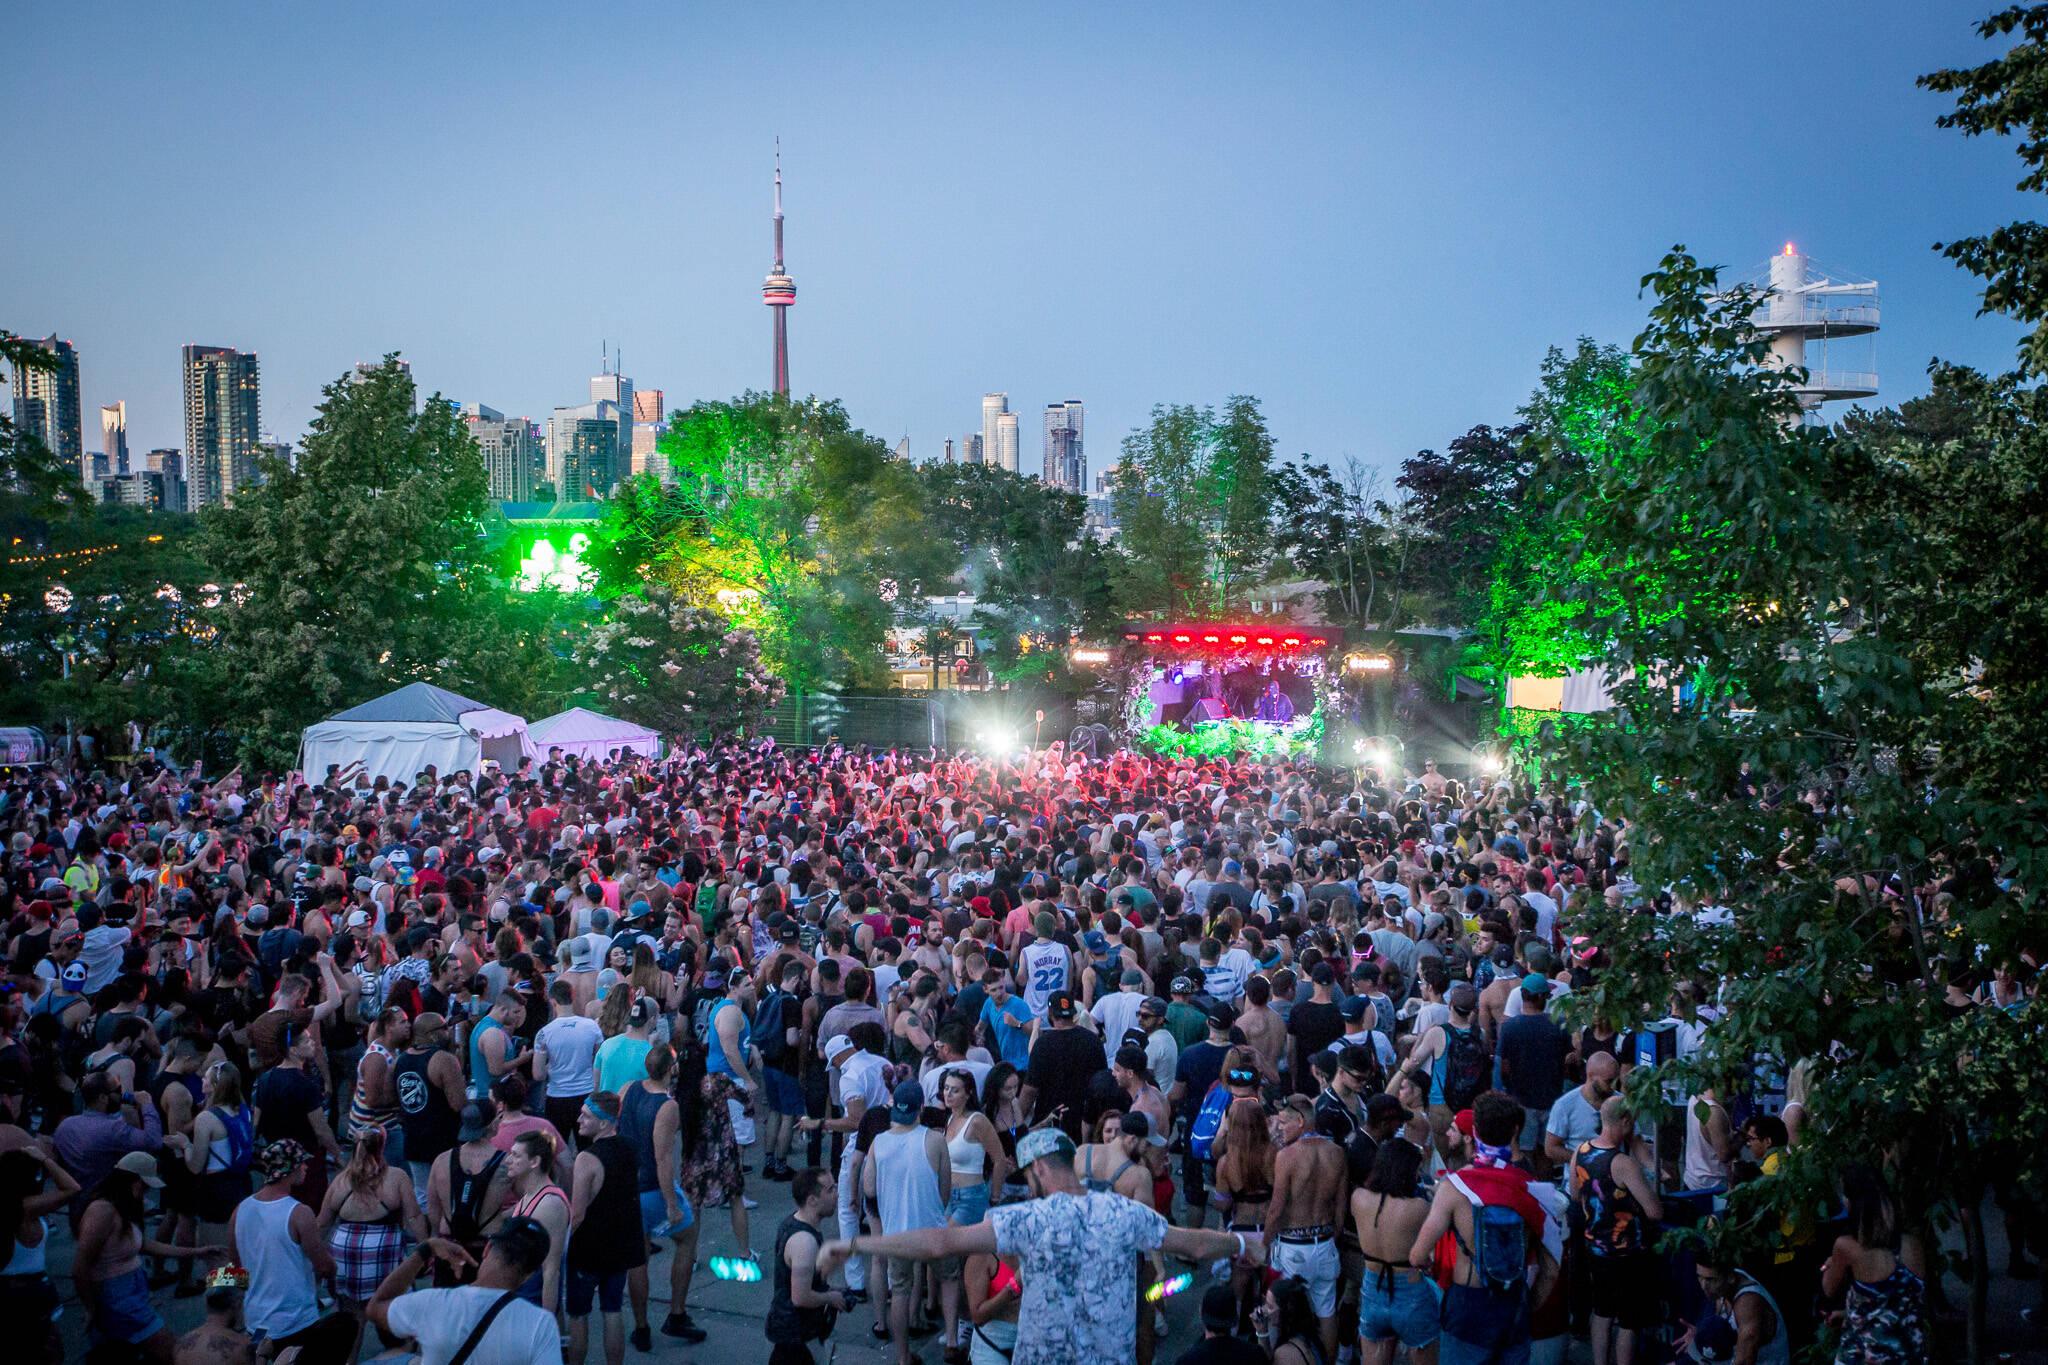 Bud Light Dreams Toronto